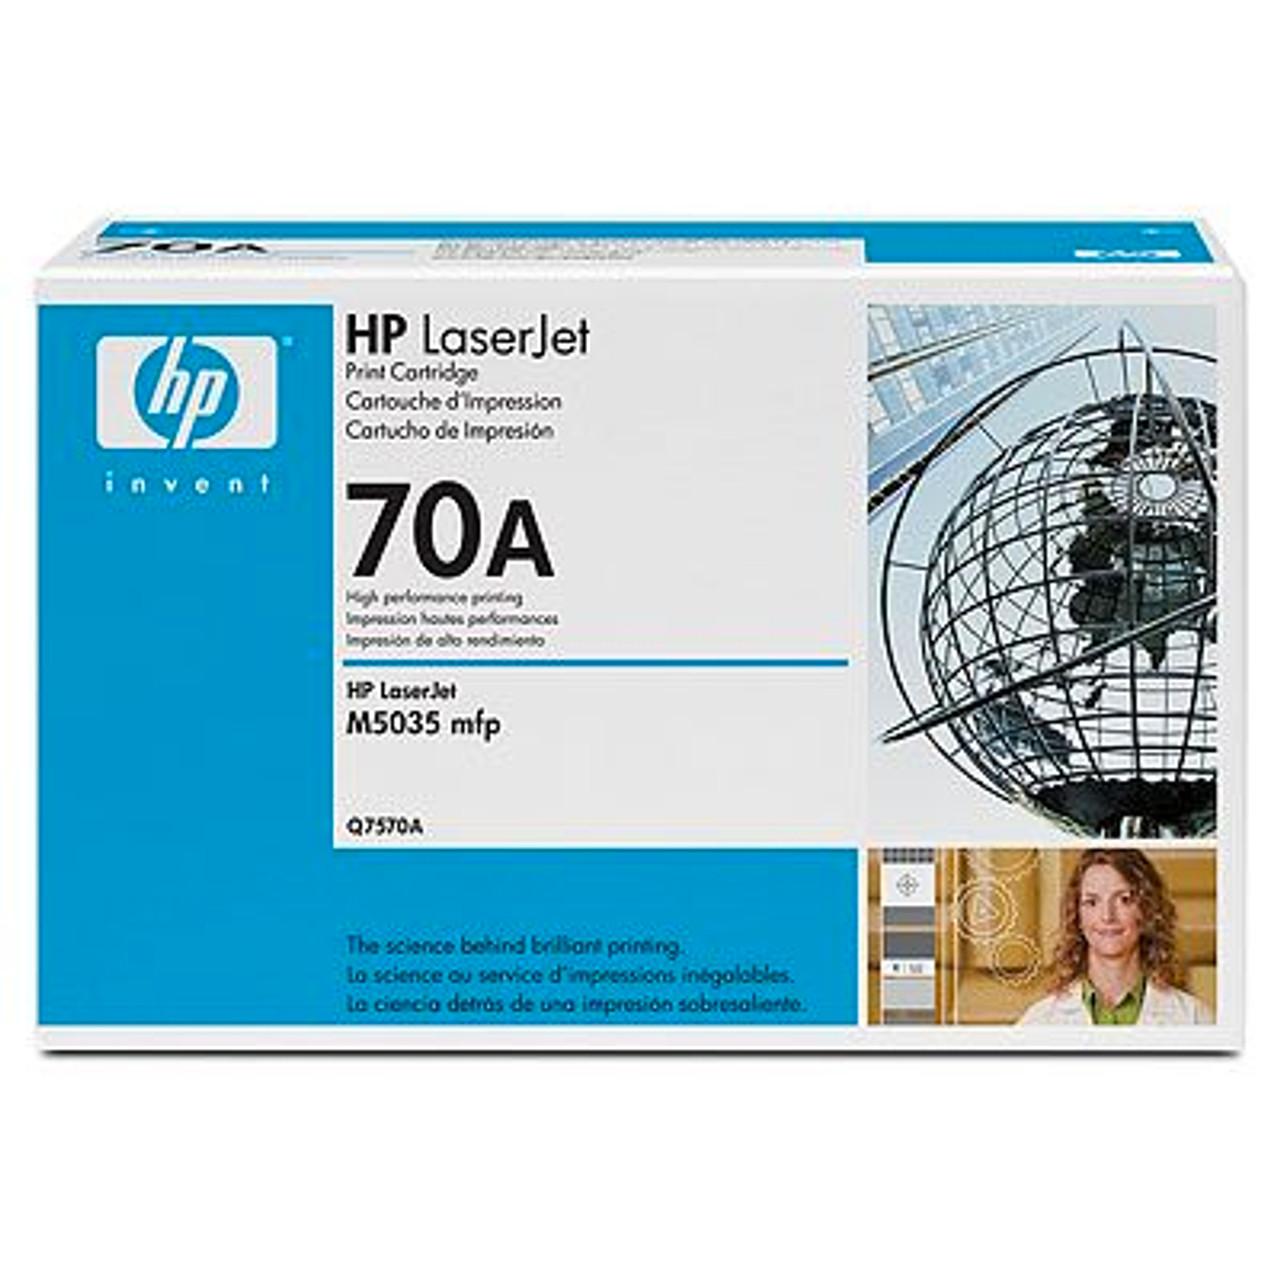 HP M5025 M5035 70a Toner Cartridge - New OEM